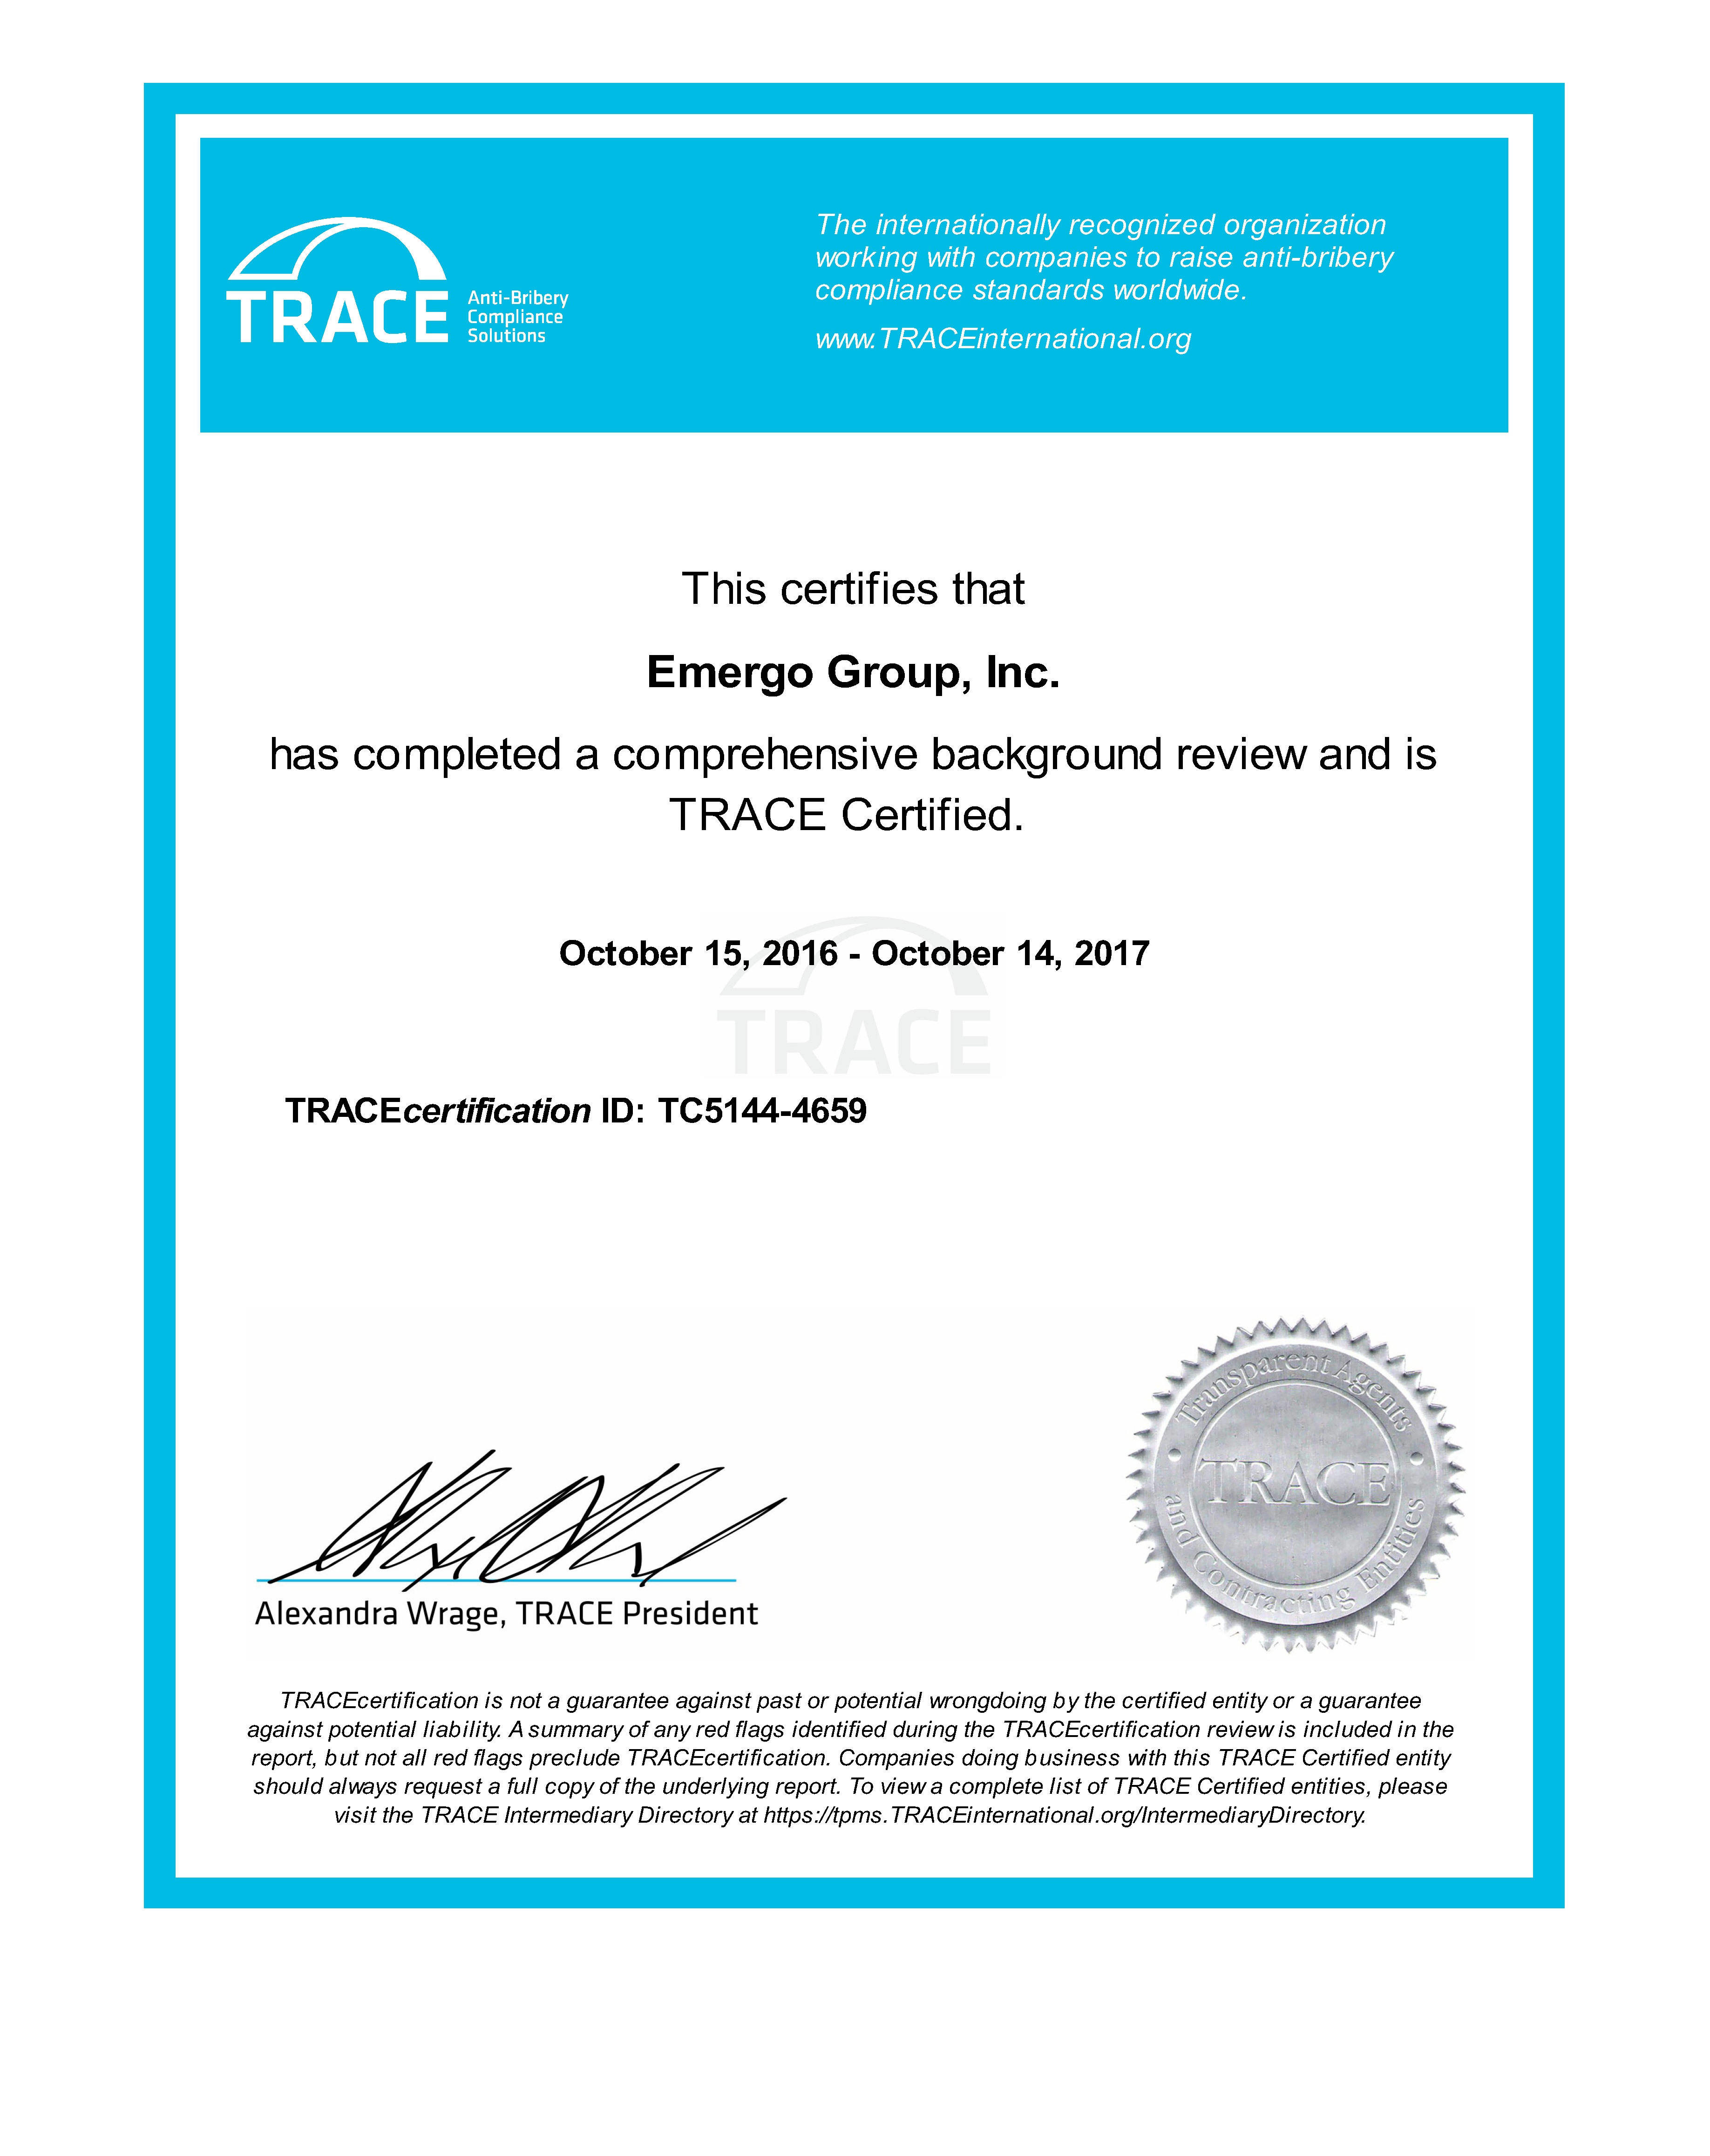 Emergo TRACE certificate